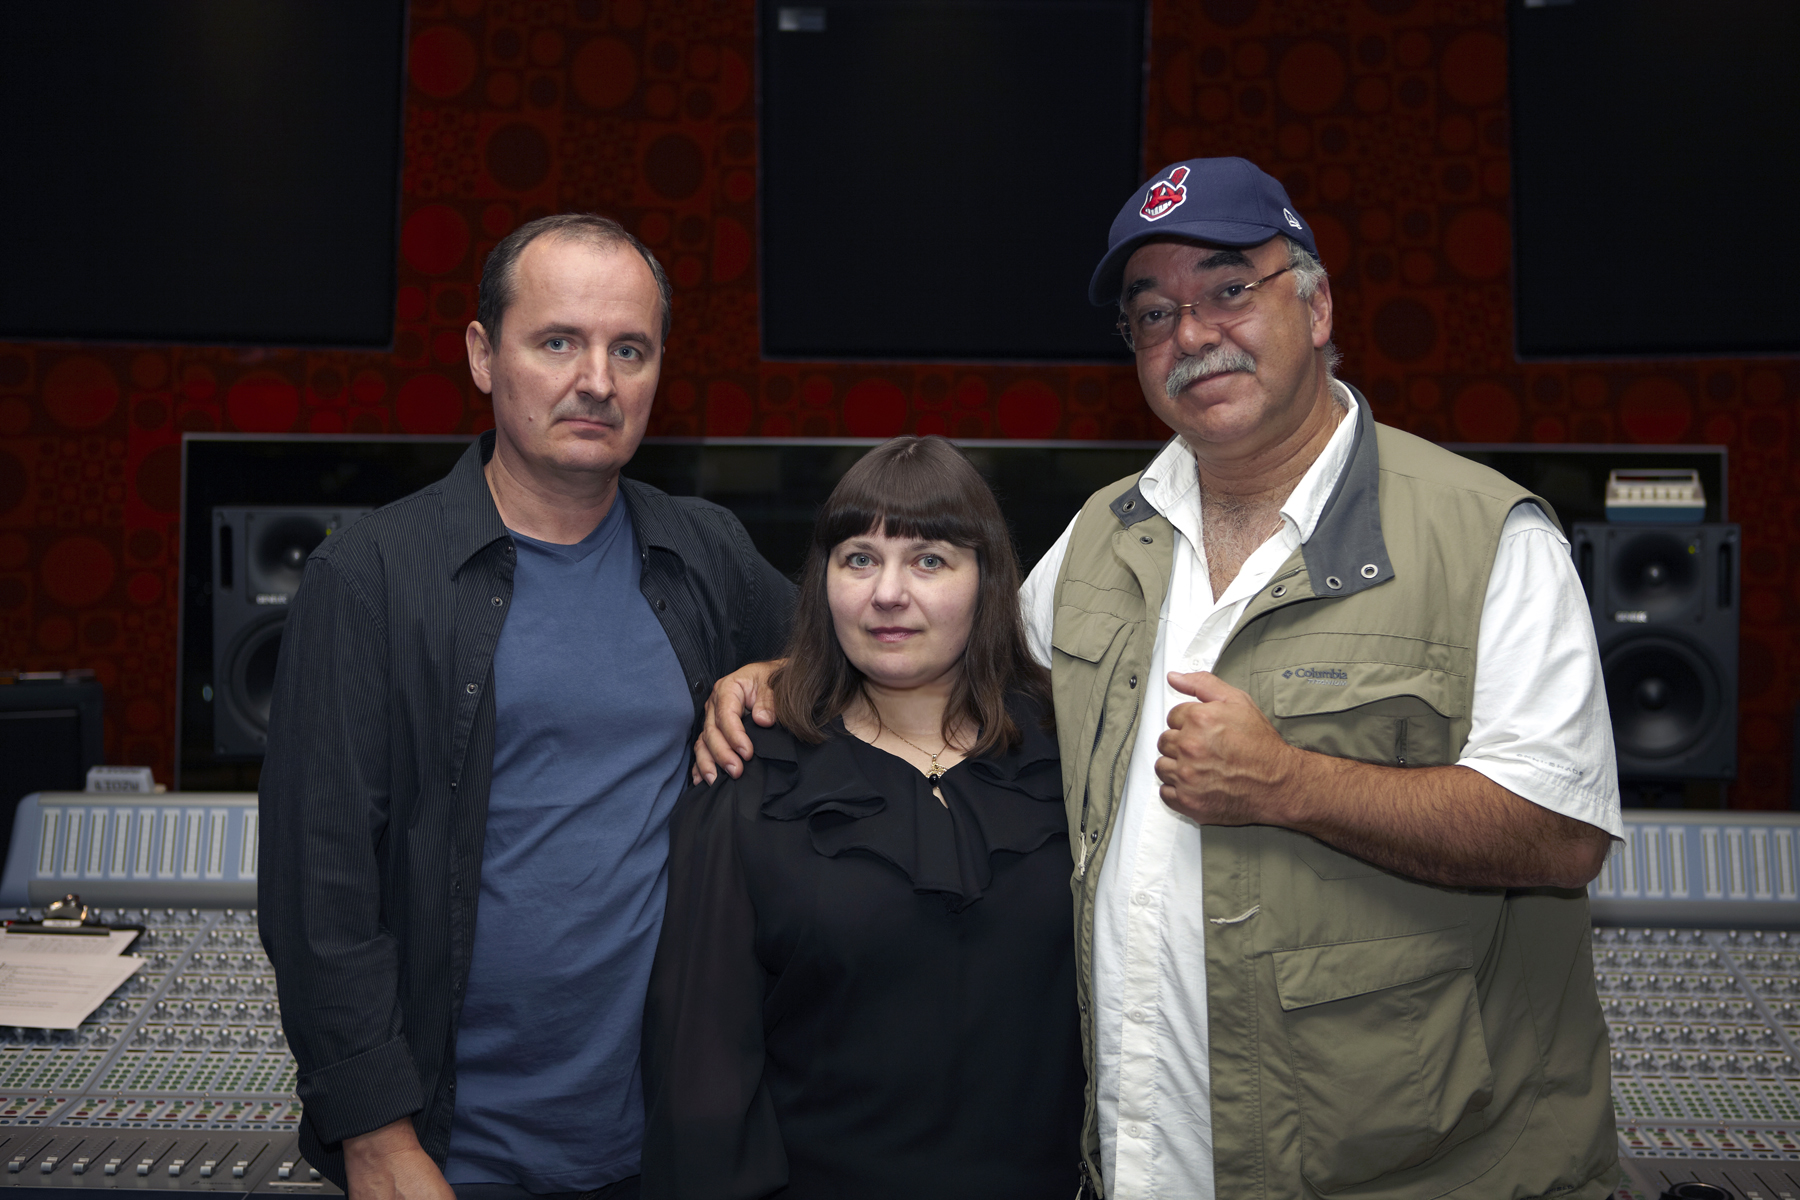 Darek Oles, Yelena Eckemoff, Peter Erskine